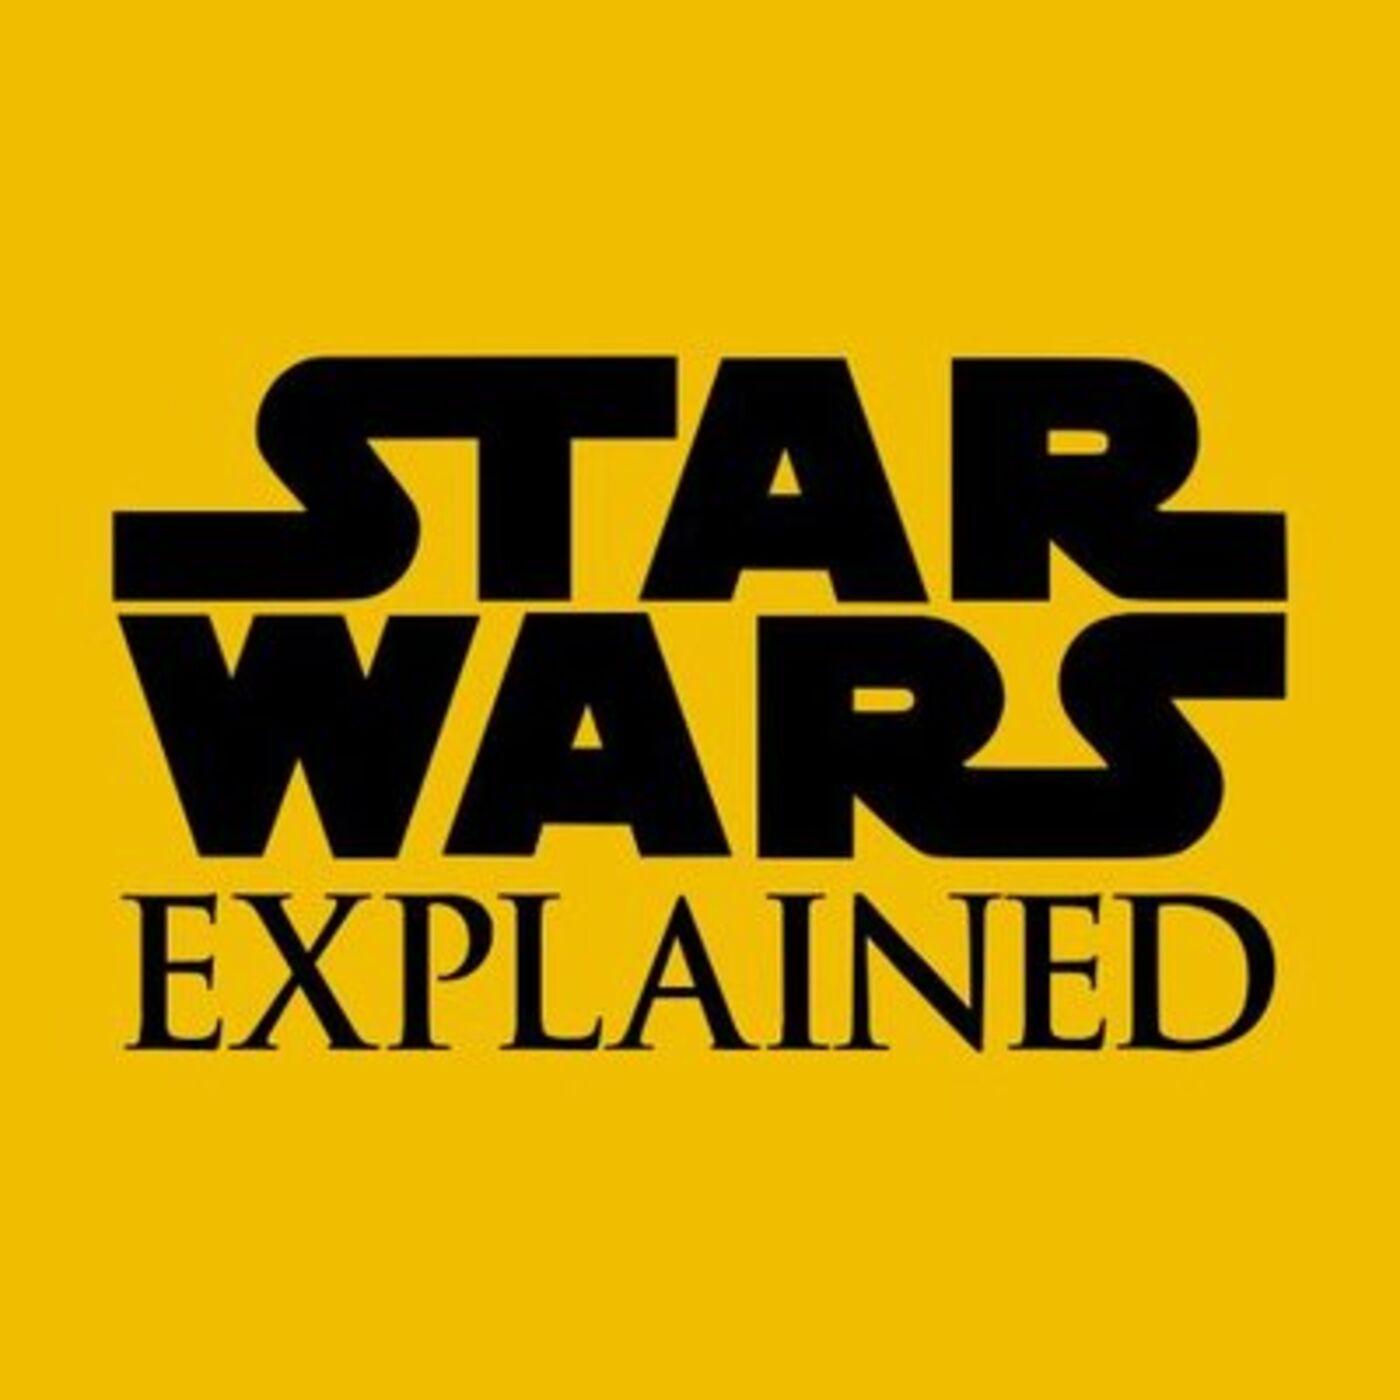 Star Wars Disney+ Series News - Updates for The Book of Boba Fett, Andor, Obi-Wan Kenobi, and More!